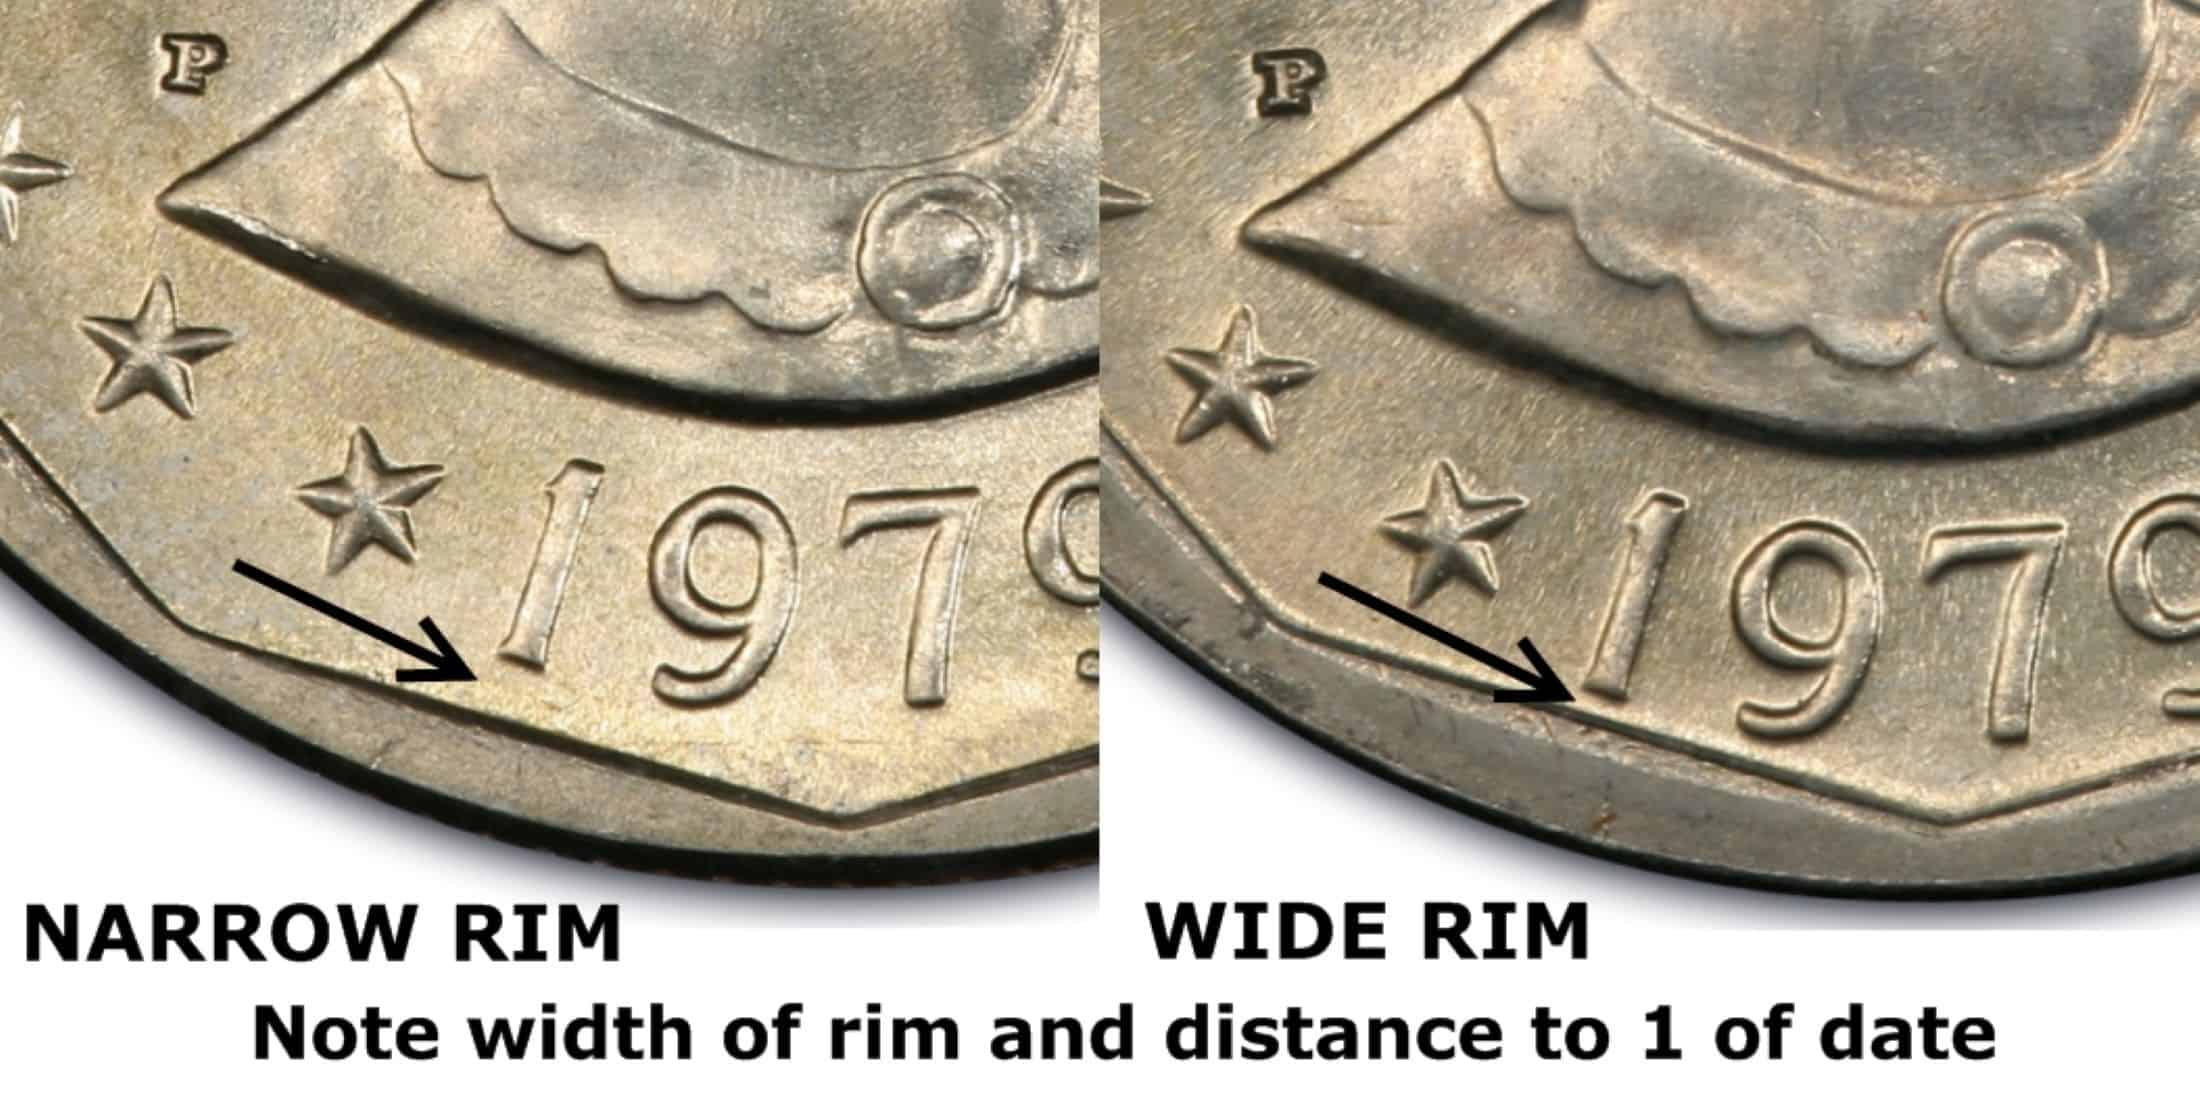 The Wide Rim Silver Dollar Coin